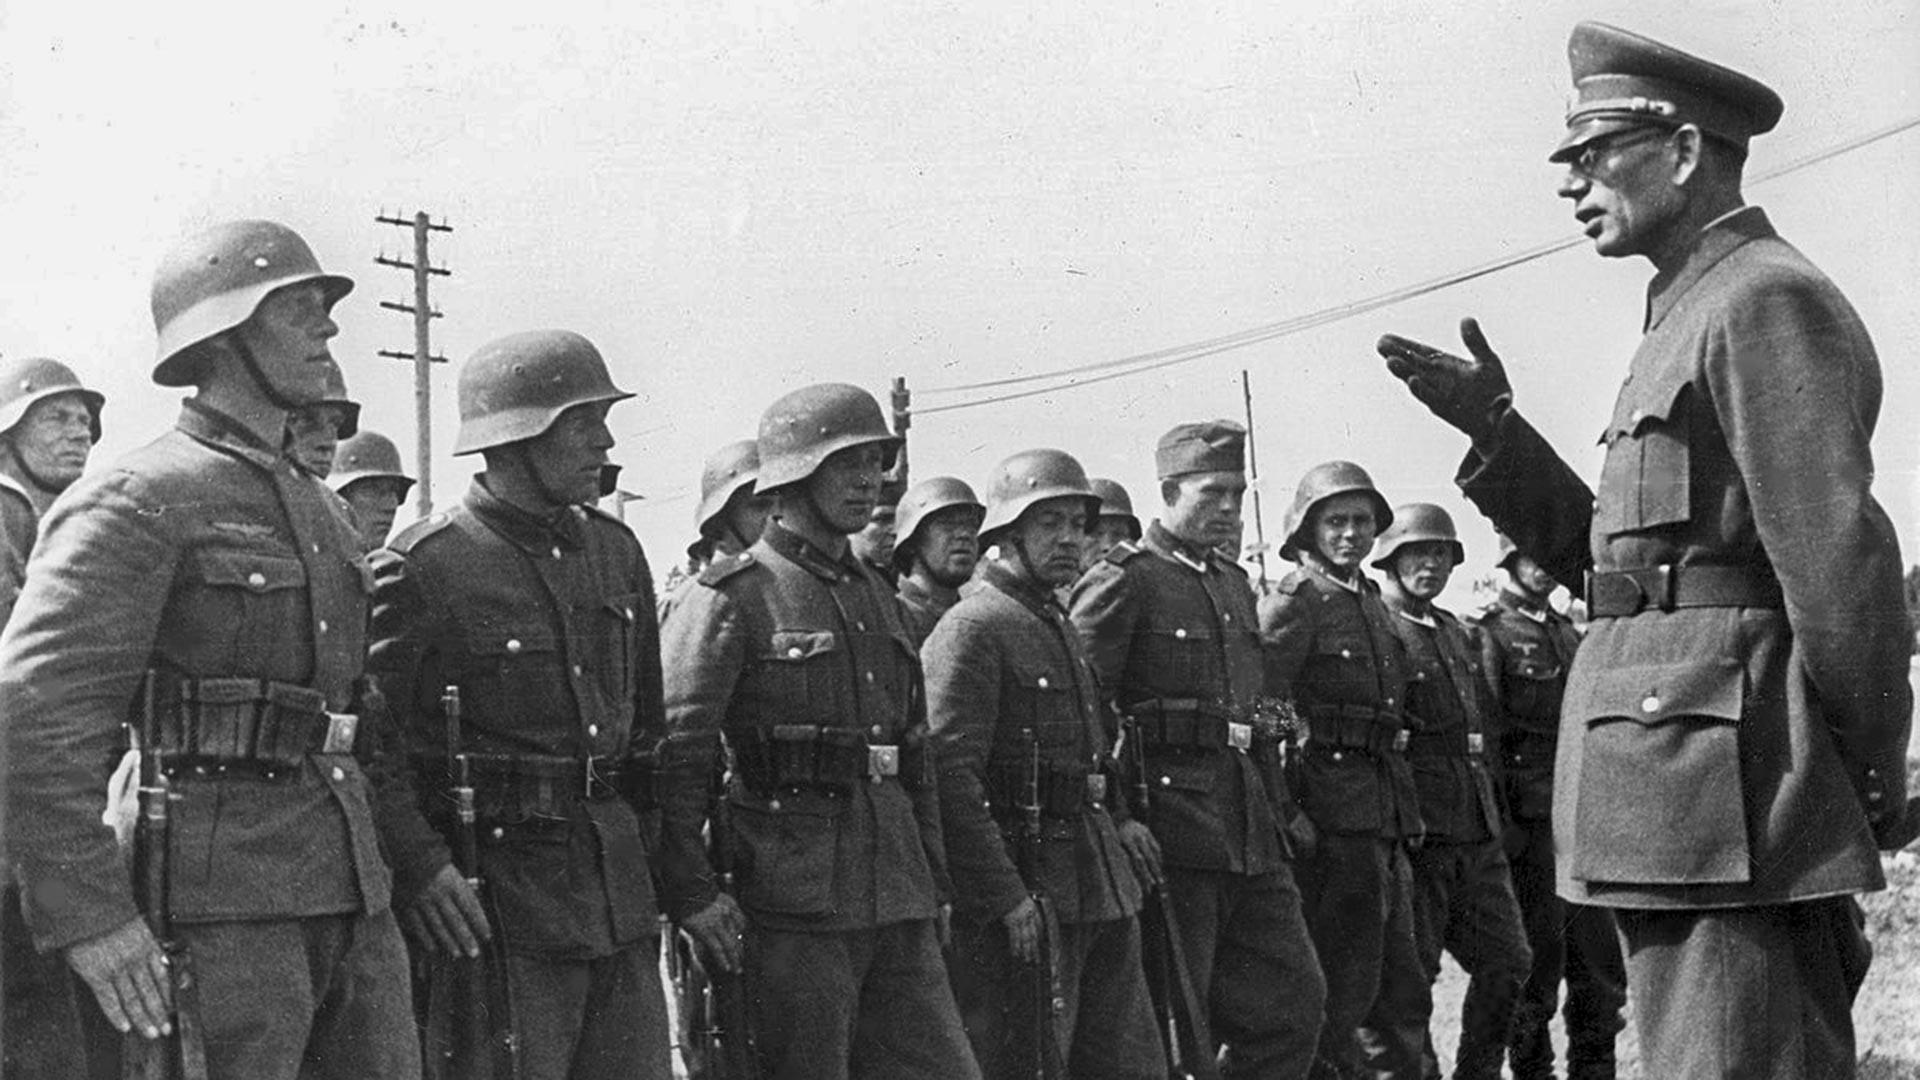 Andrei Wlassow mit den Soldaten der Nationalen Befreiungsarmee Russlands